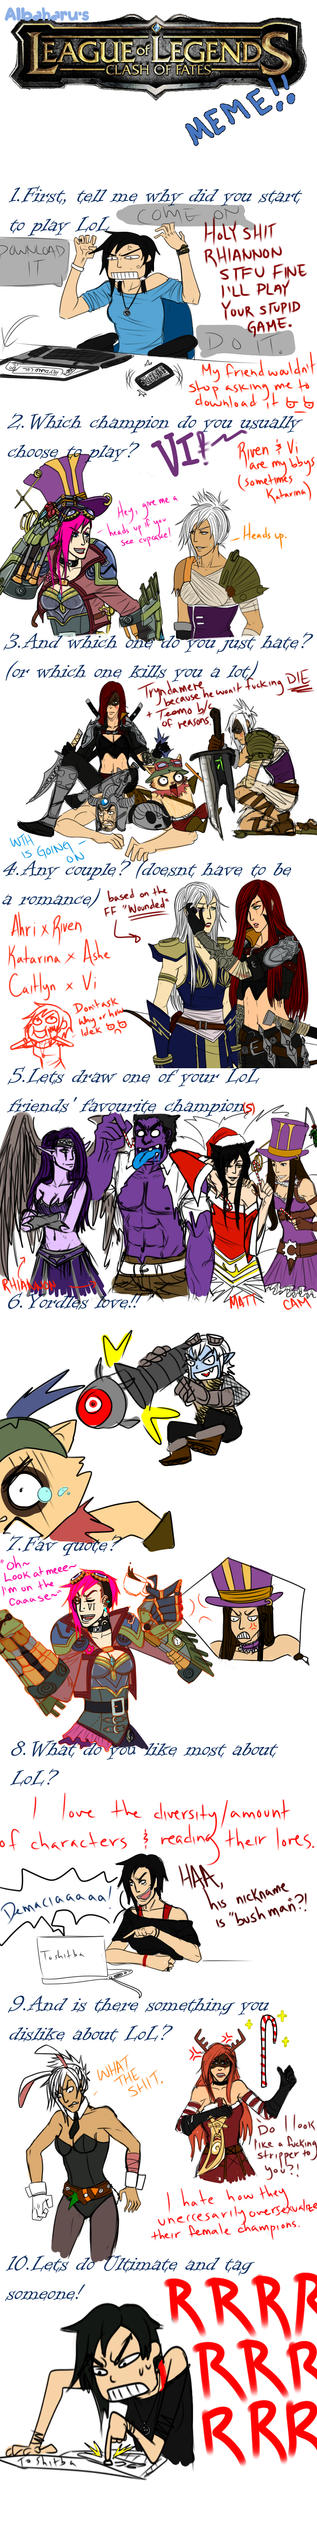 League Of Legends Meme by Ryuuuna